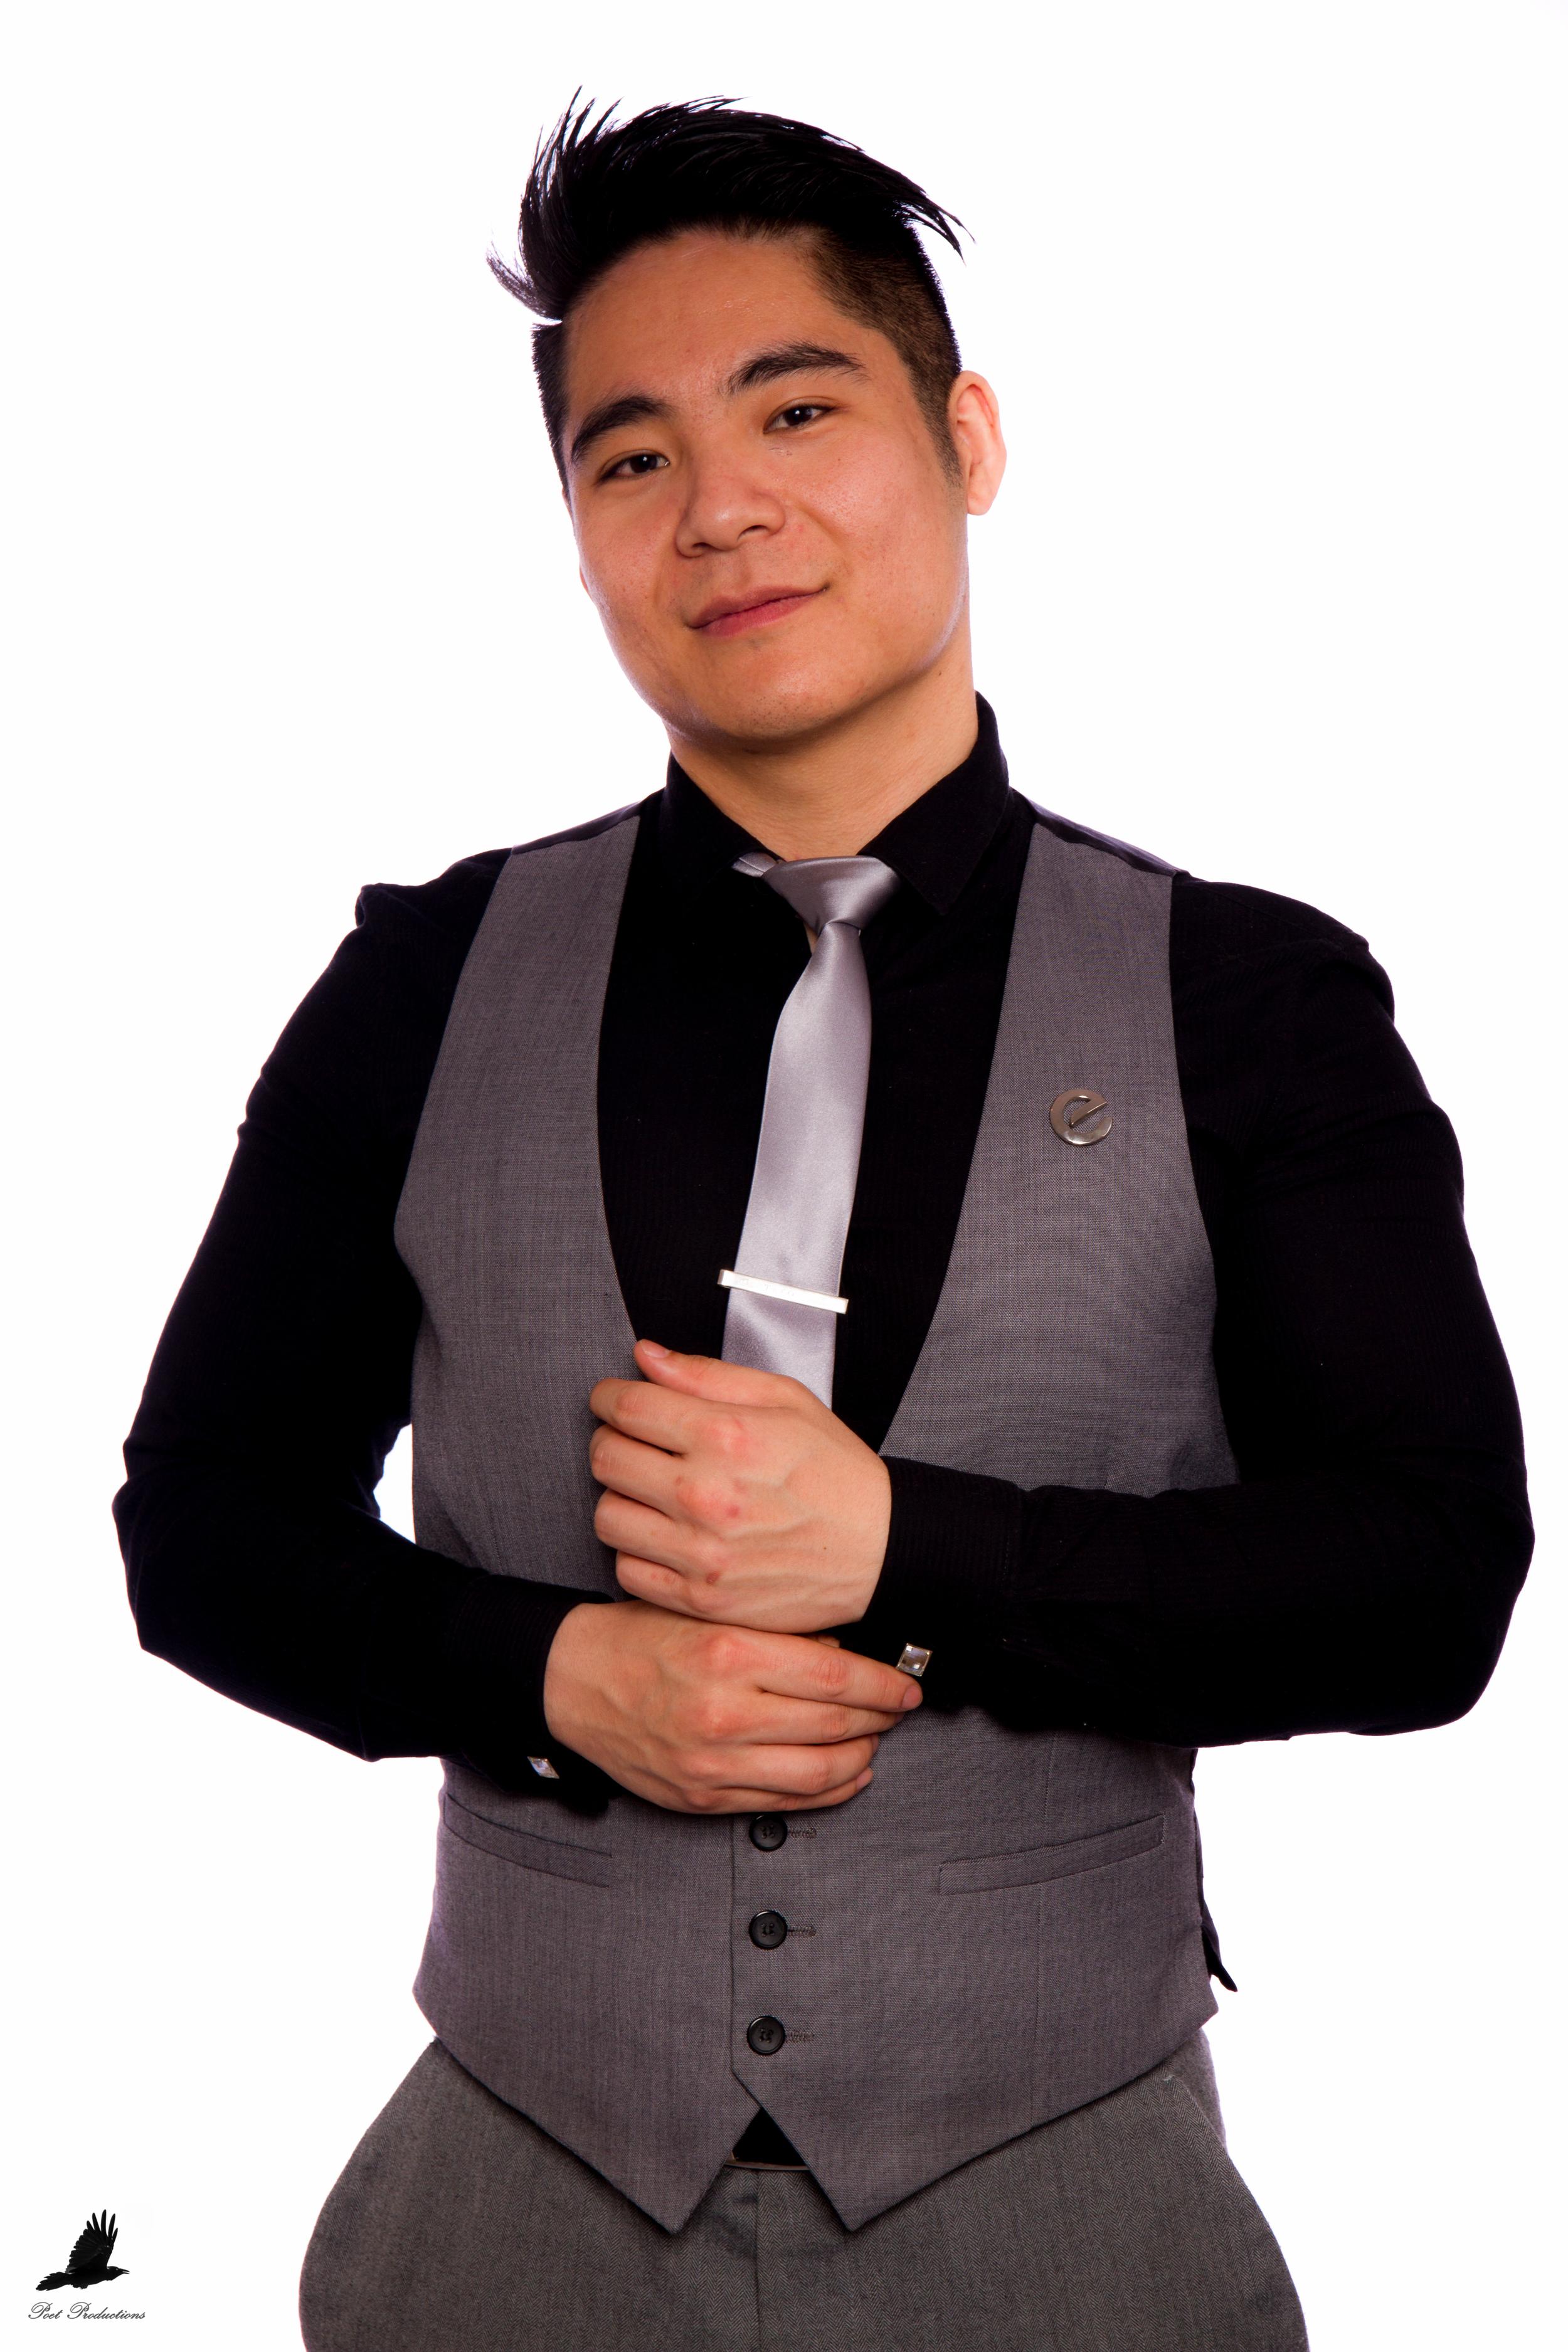 Raman Chen